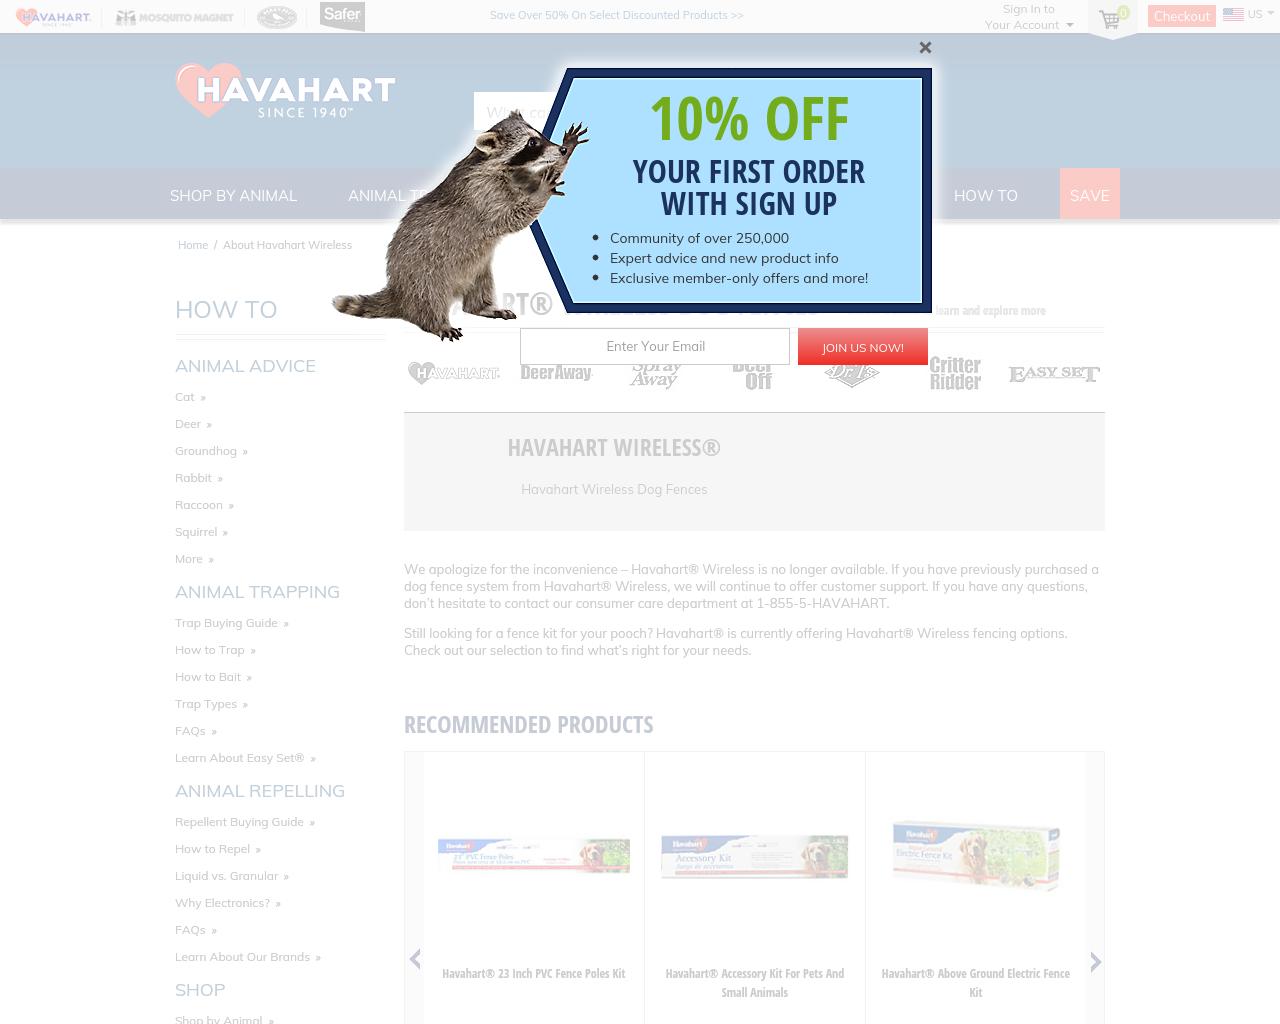 Havahart-wireless-Advertising-Reviews-Pricing